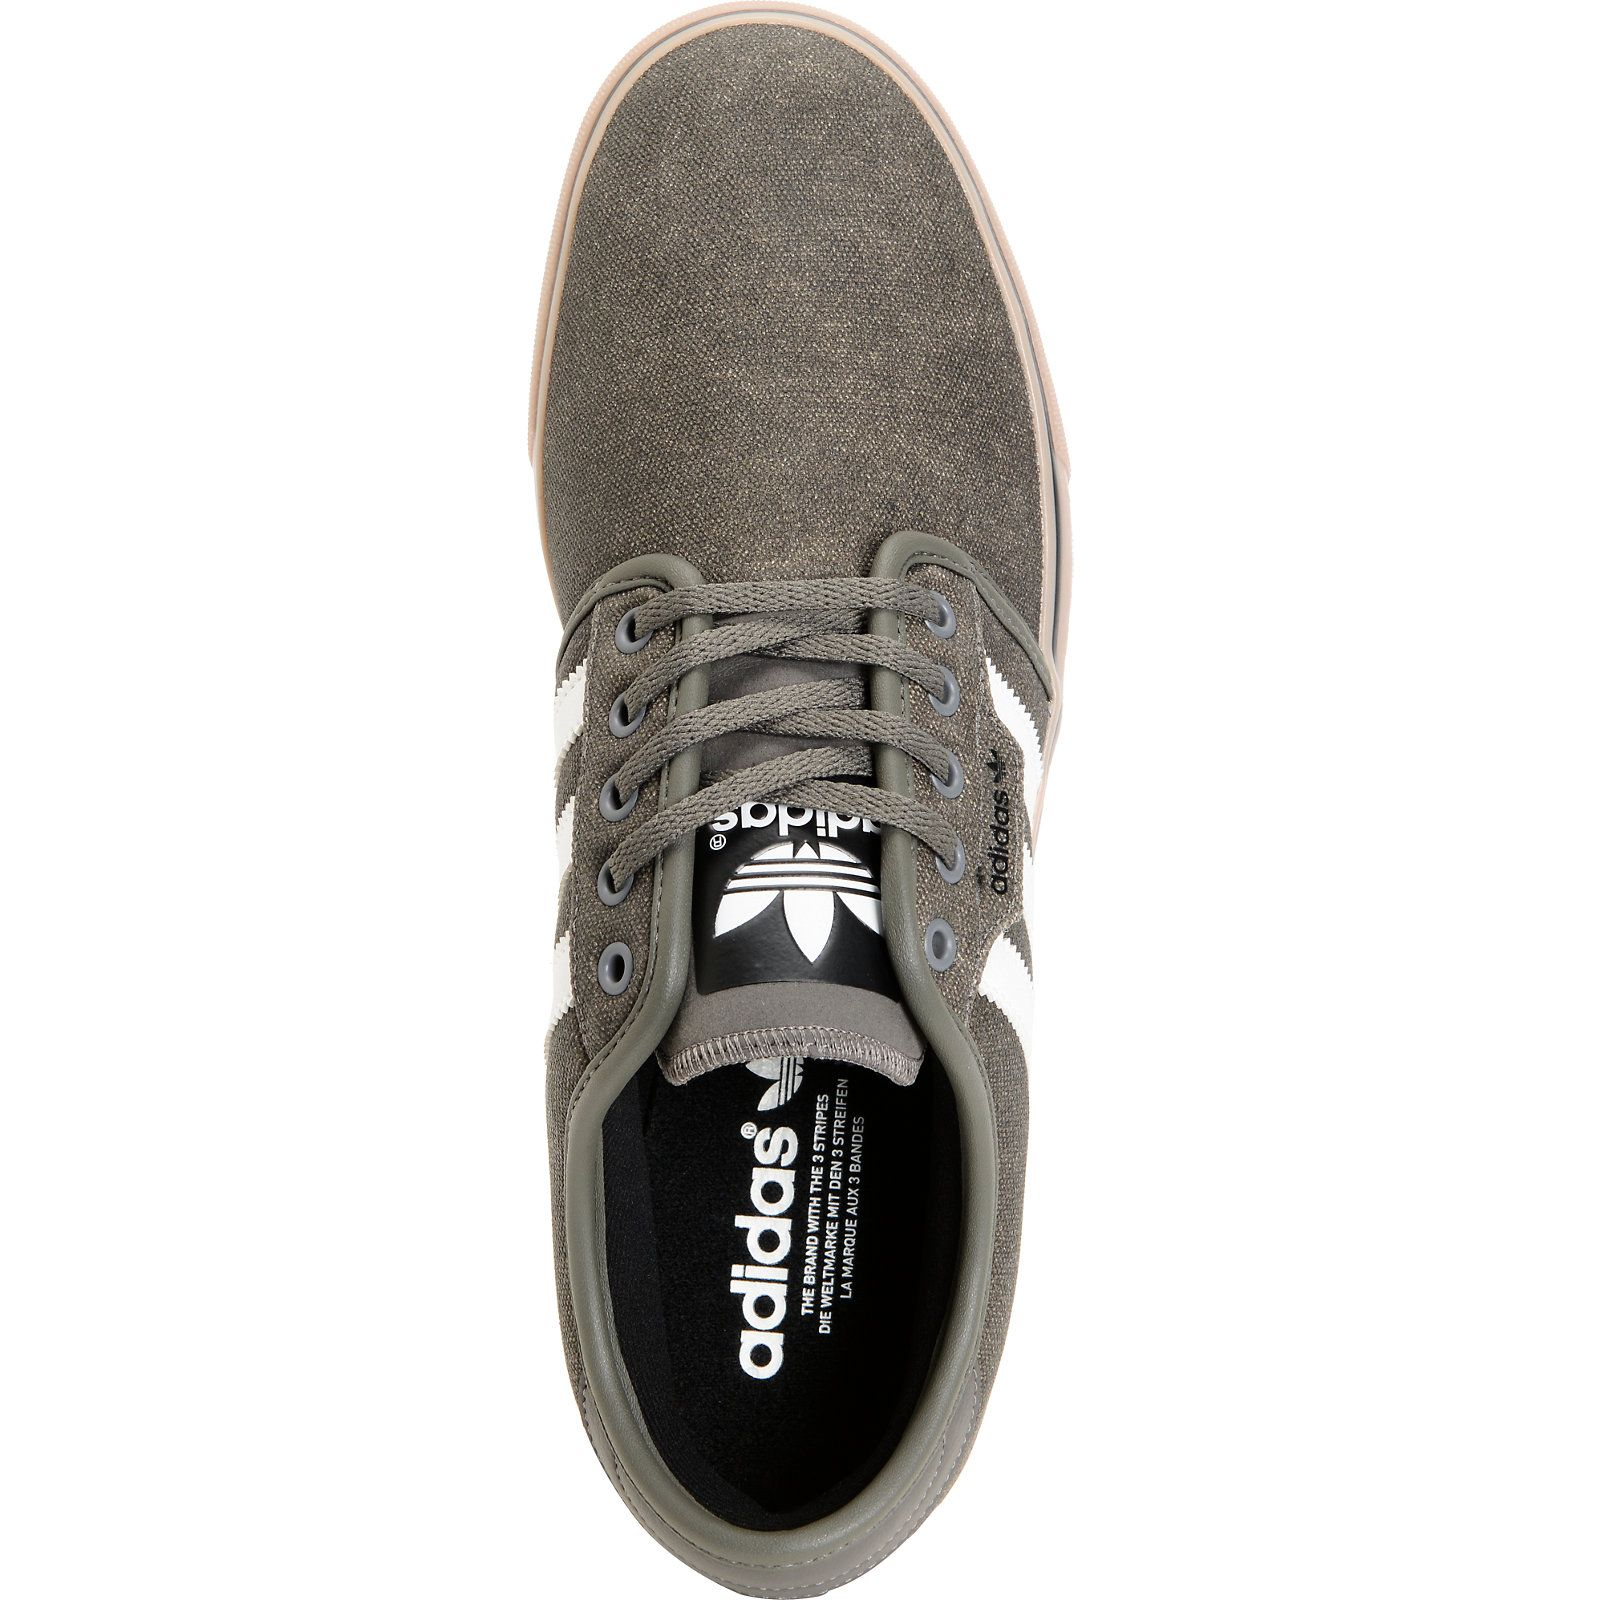 Dominante Cerdo carpeta  adidas Seeley Mid Cinder Waxed Canvas & Gum Shoe | Shoes, Adidas, Skate  shoes